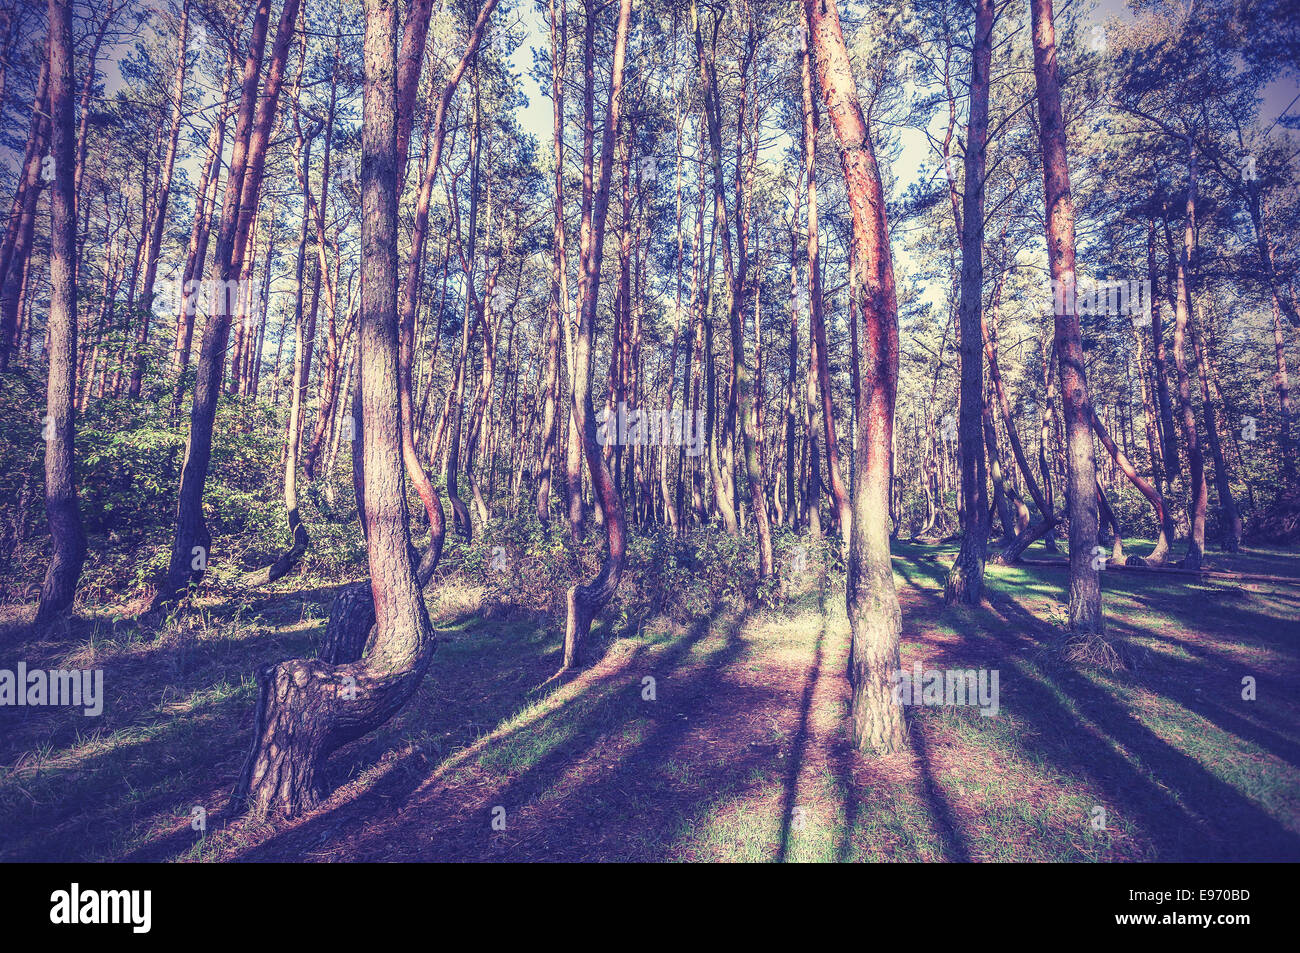 Imagen de estilo vintage de Crooked Forest, Polonia. Imagen De Stock